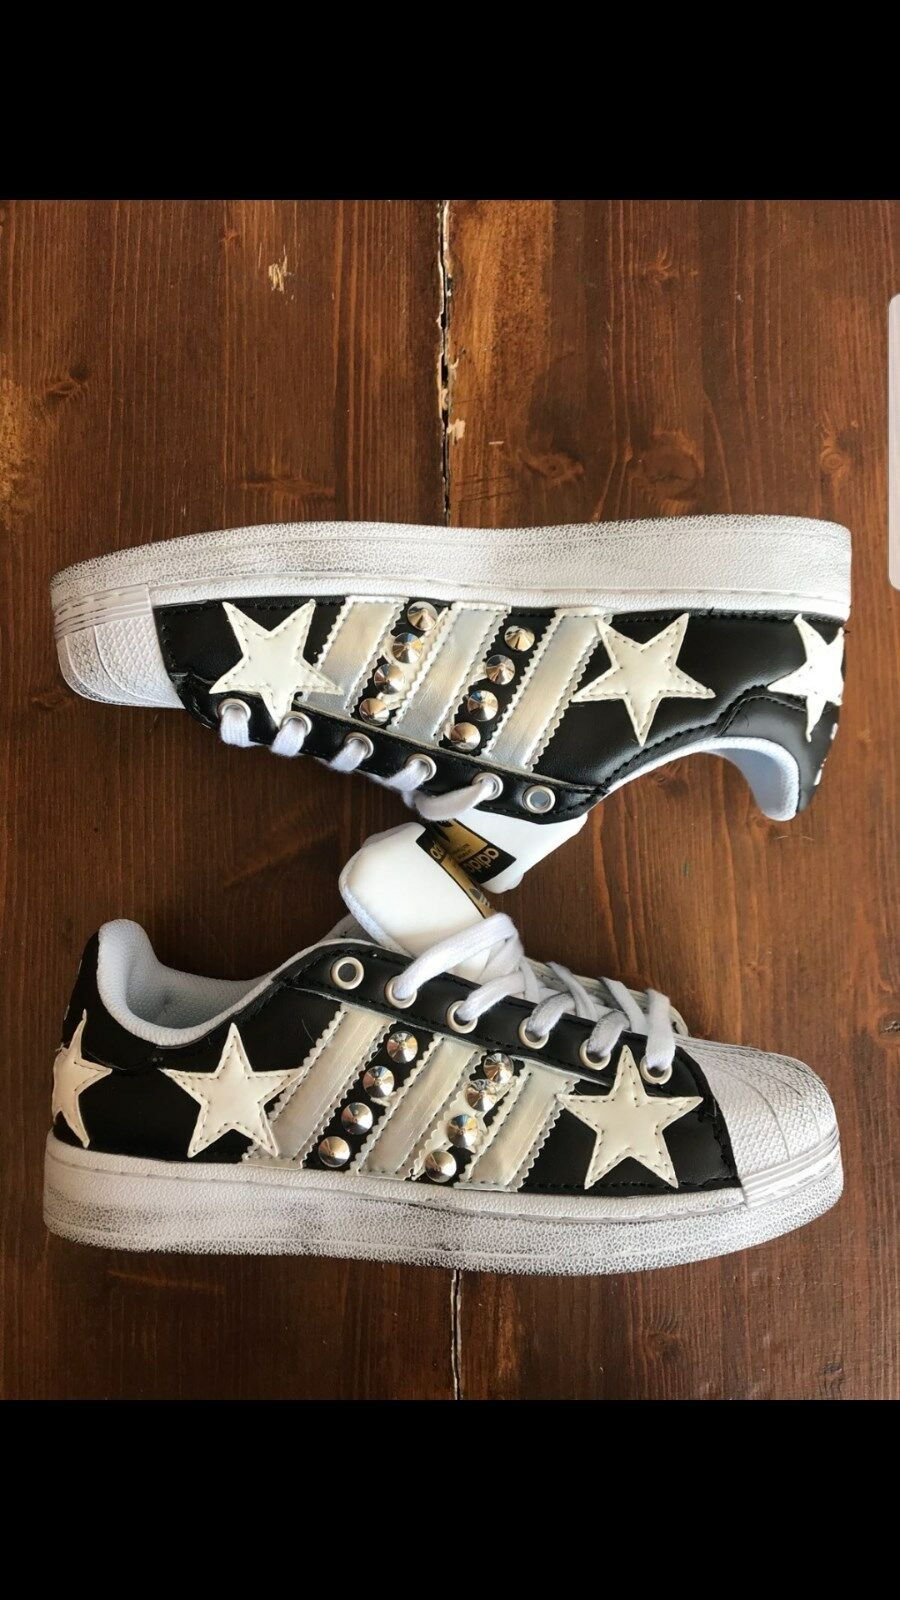 zapatos e adidas superstar con borchie e zapatos pelle nera con stelle in pelle bianca 845067